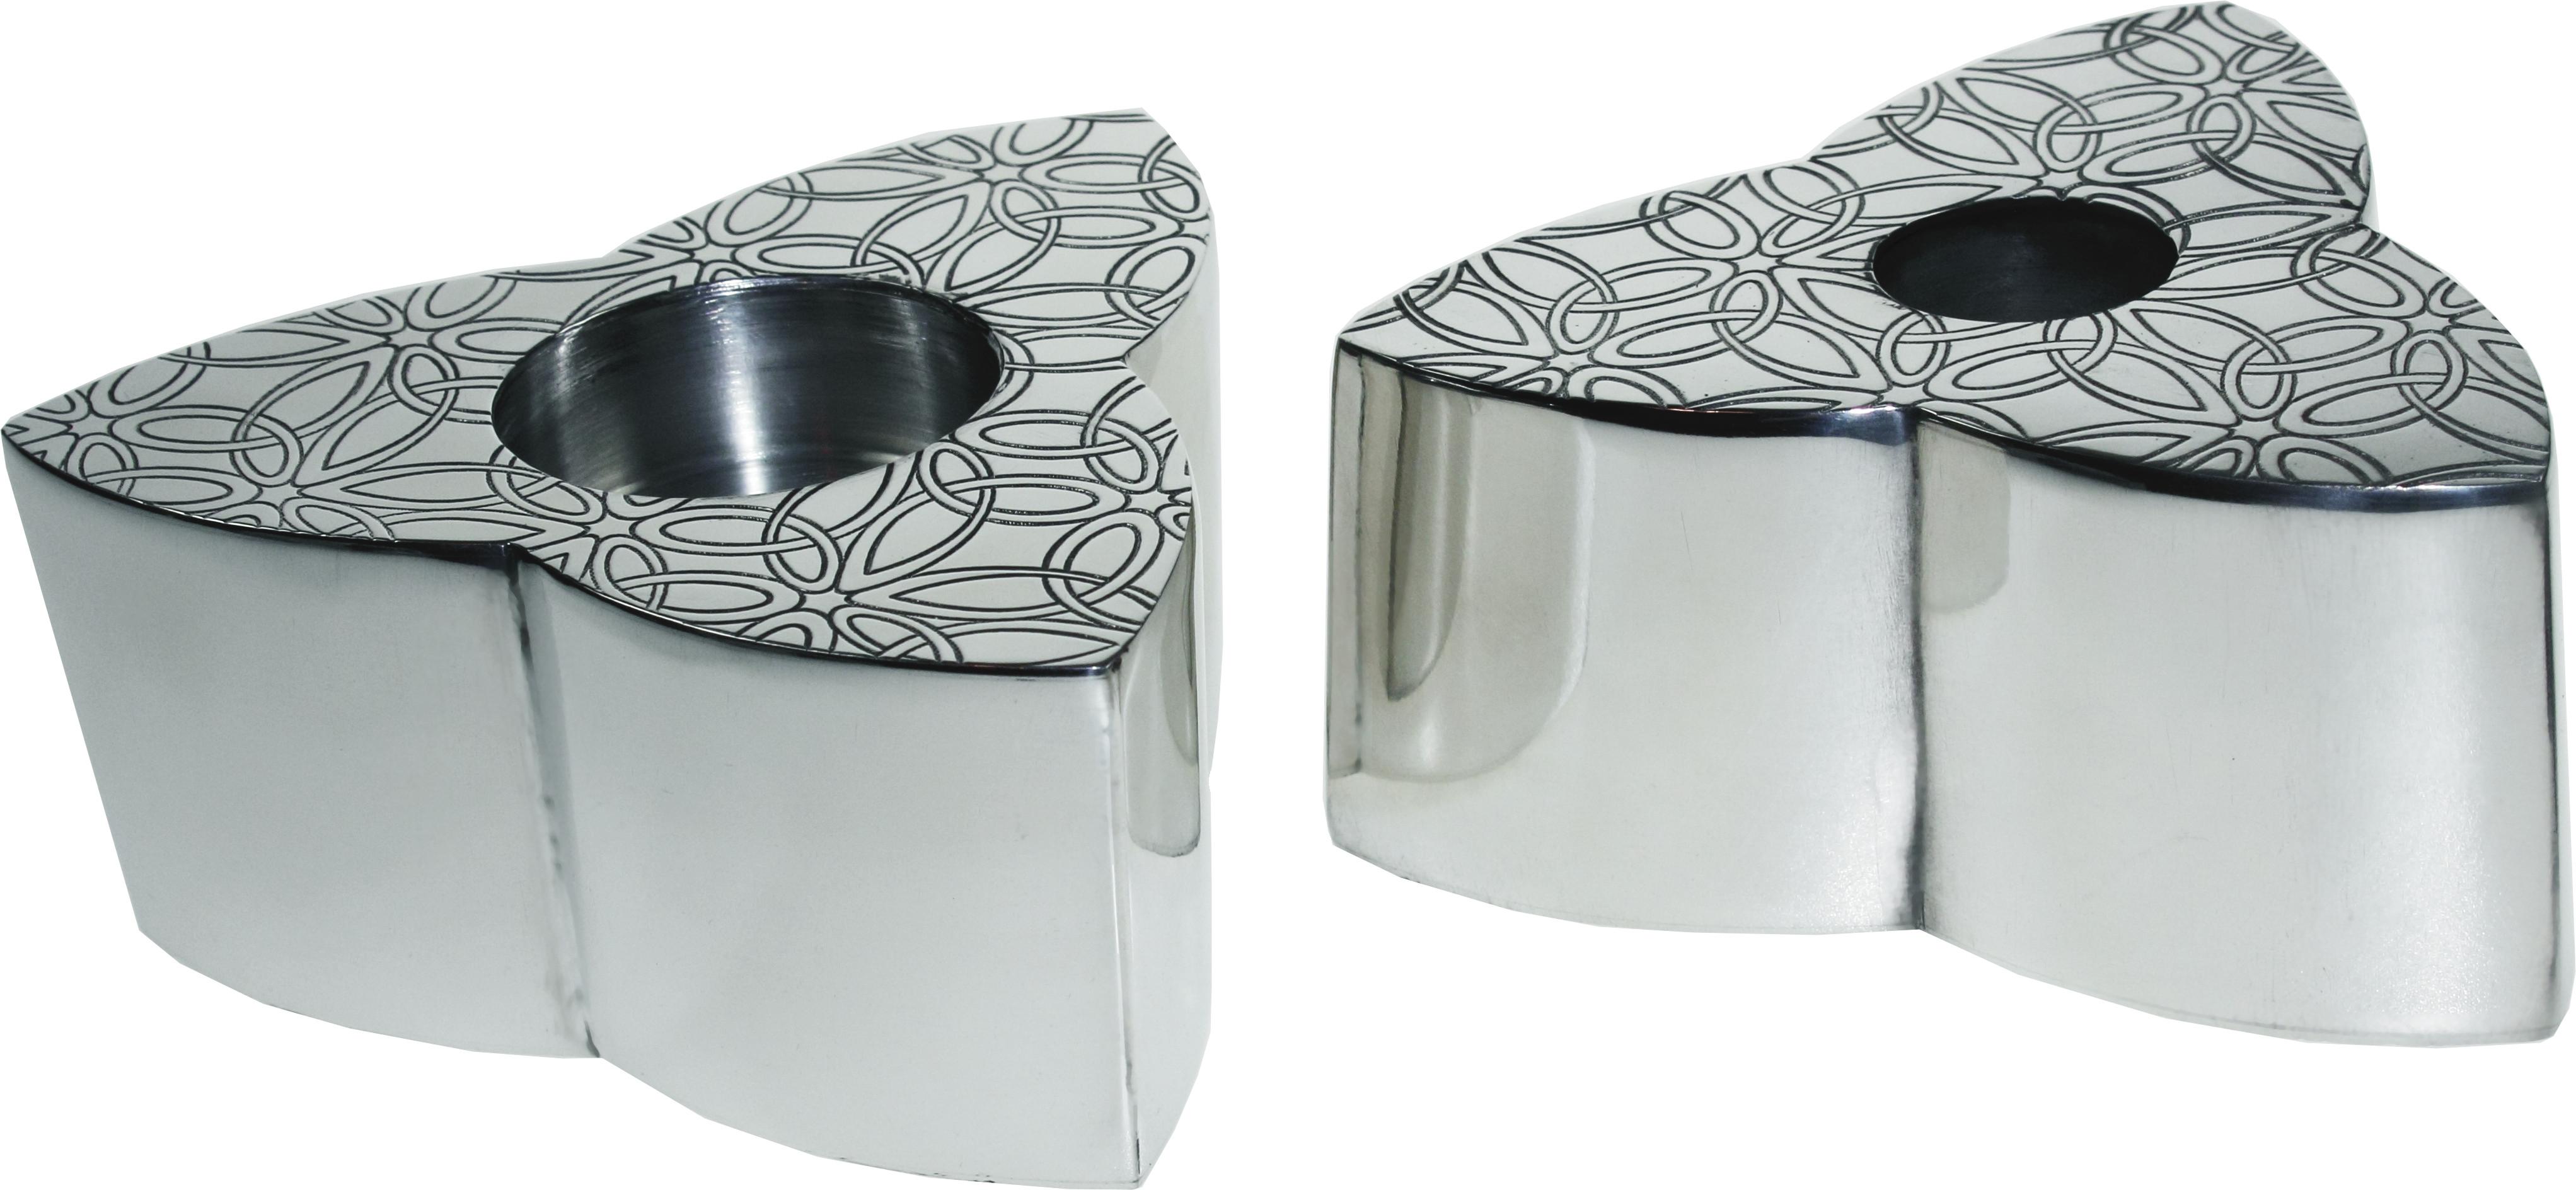 "Triquetra Reversible Dual Candle Holder 5cm (2"")"